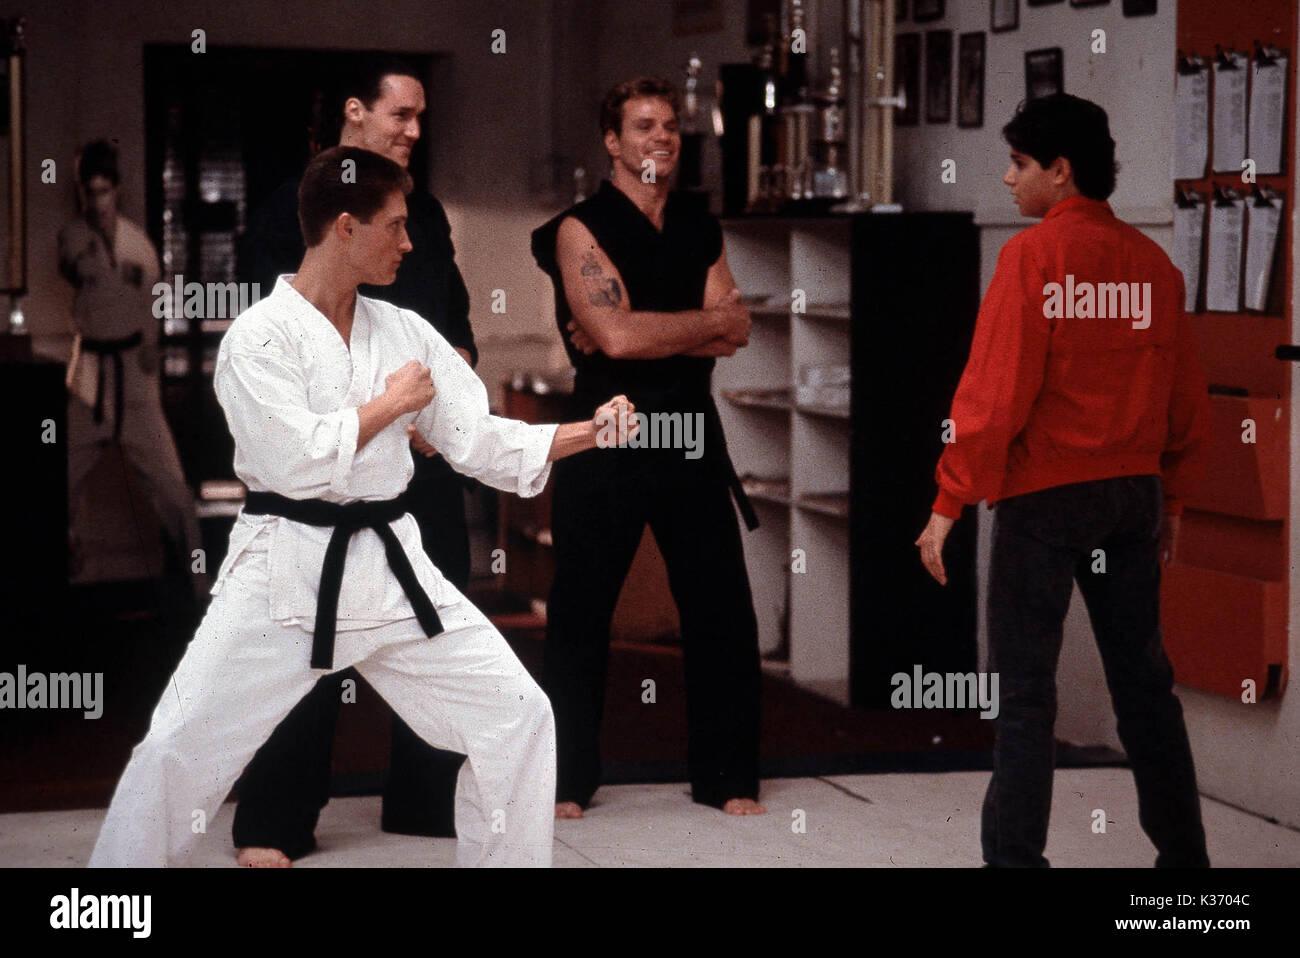 Karate dating sites